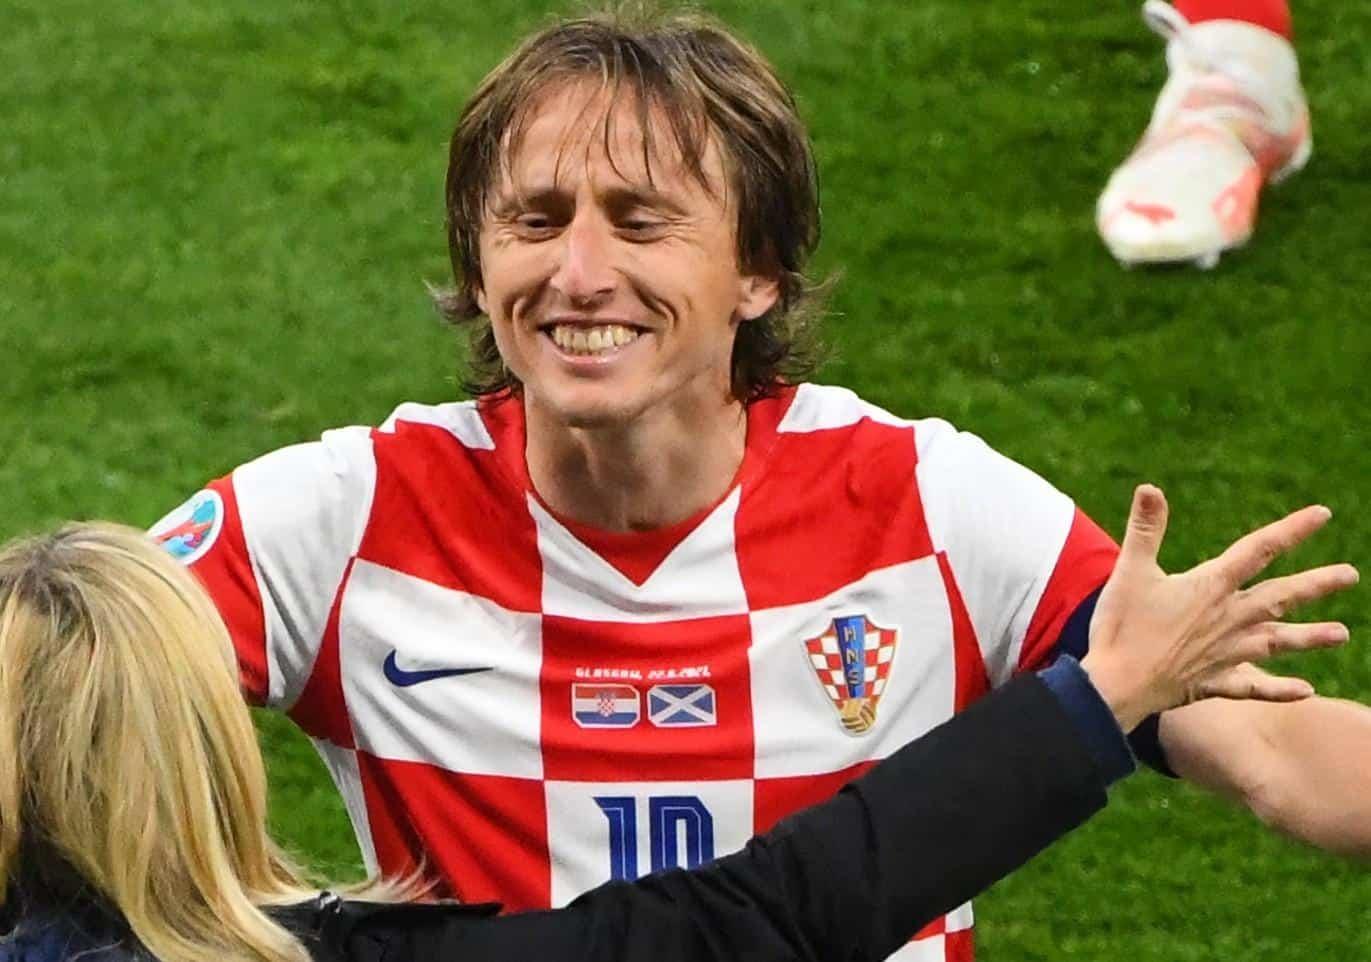 Хрватска фудбалска репрезентација на ЕУРО 2020 носи усташки грб Павелићеве НДХ! (фото)